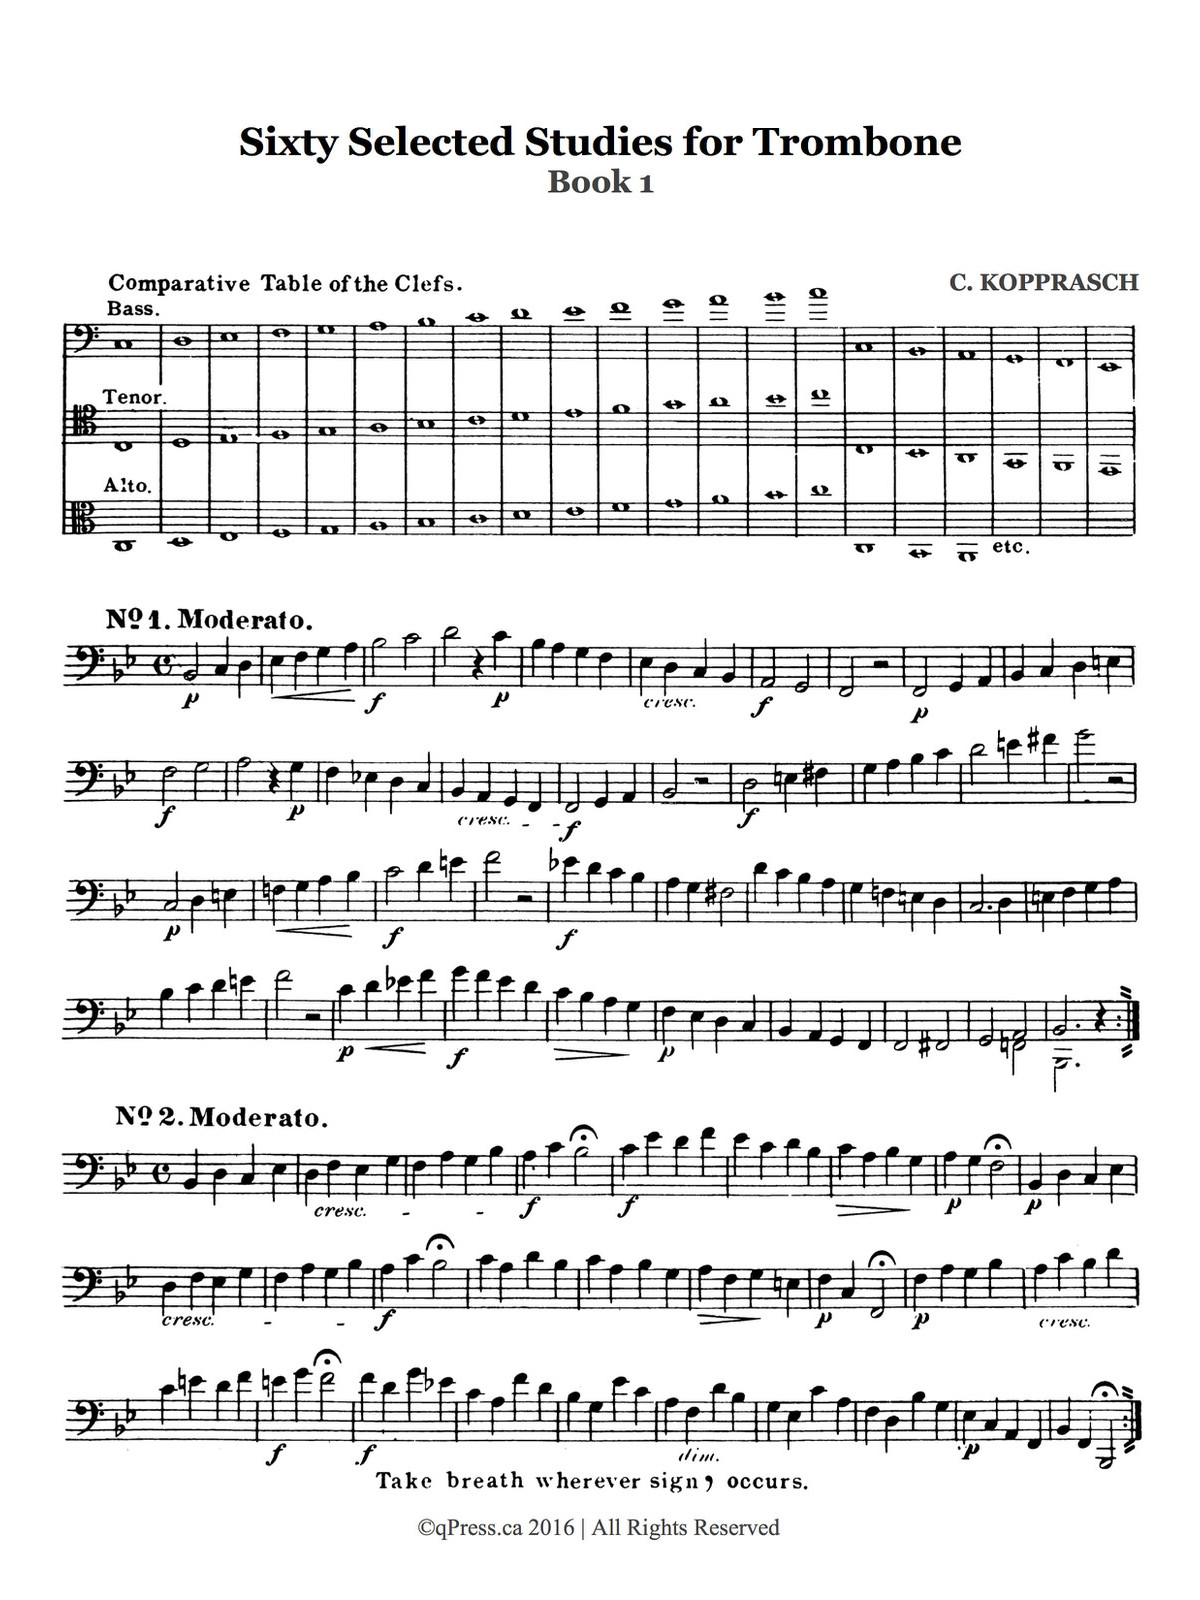 Kopprasch, 60 Selected Studies for Trombone Book 1 2